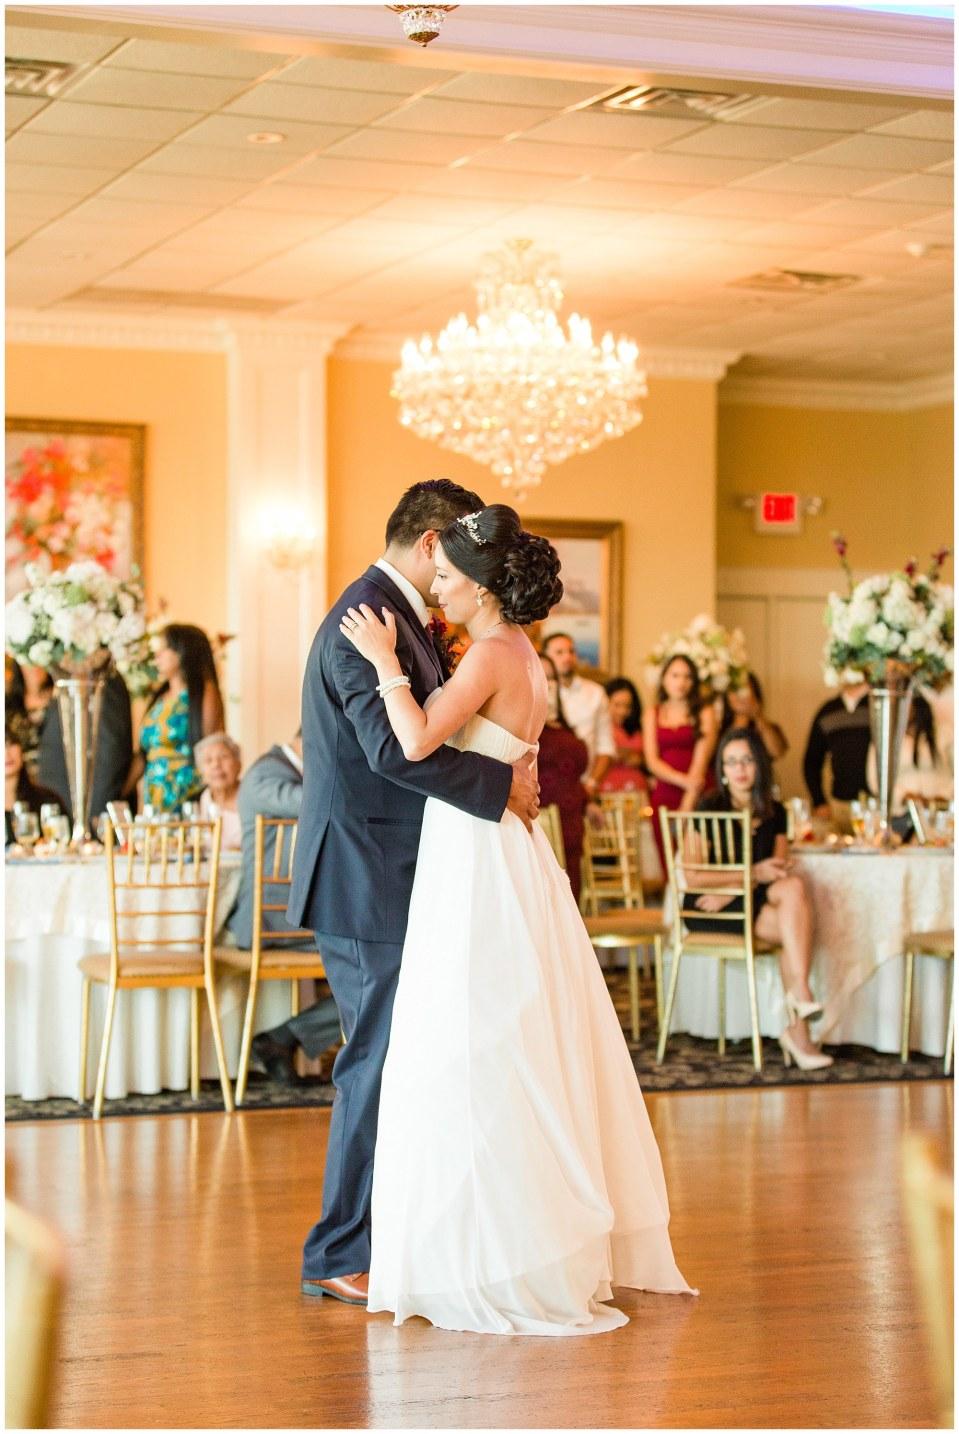 Julio & Elizabeth's Fall Wedding at Clark's Landing Yacht Club in Delran, NJ Photos_0073.jpg